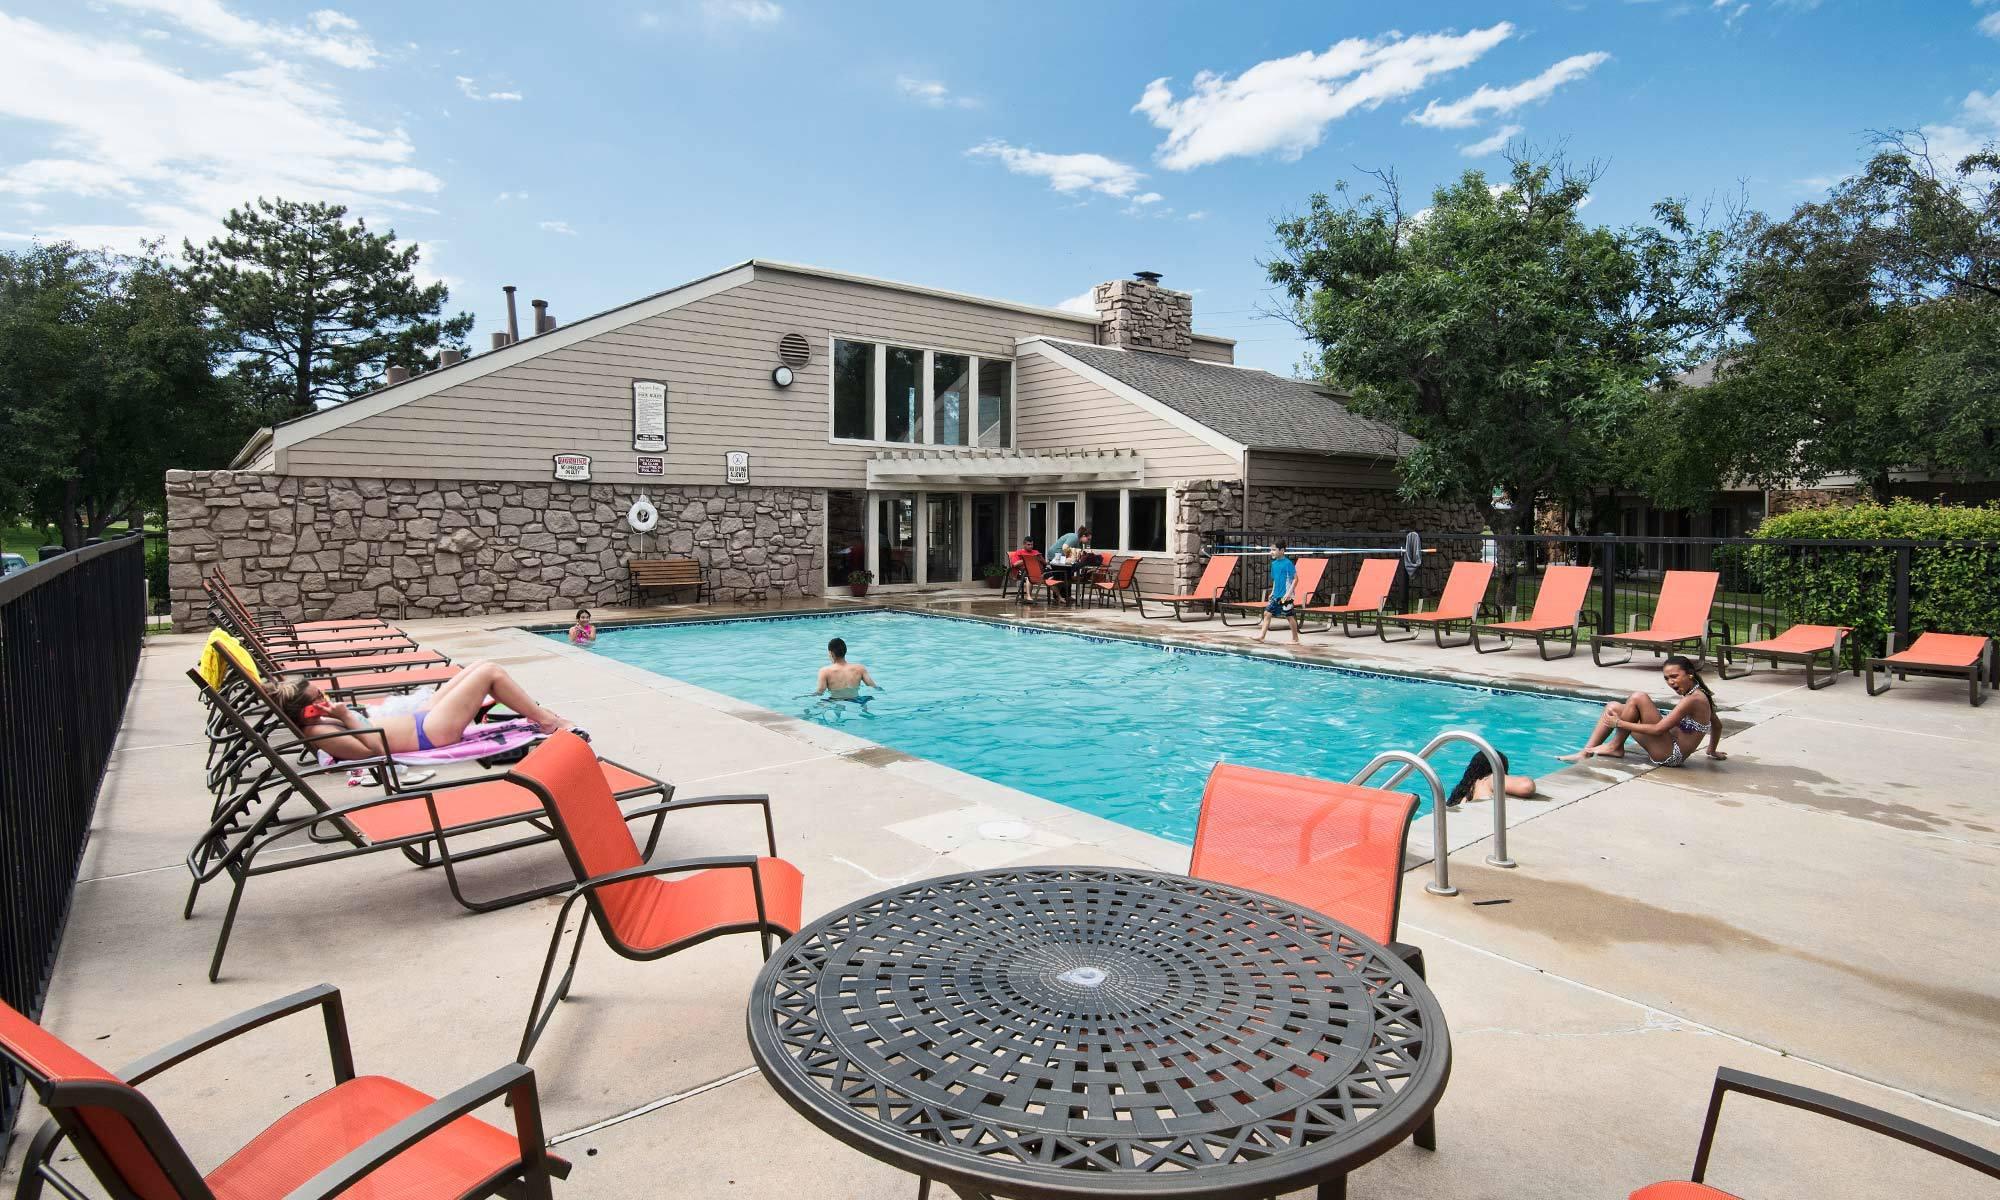 Wichita swimming pool amenities